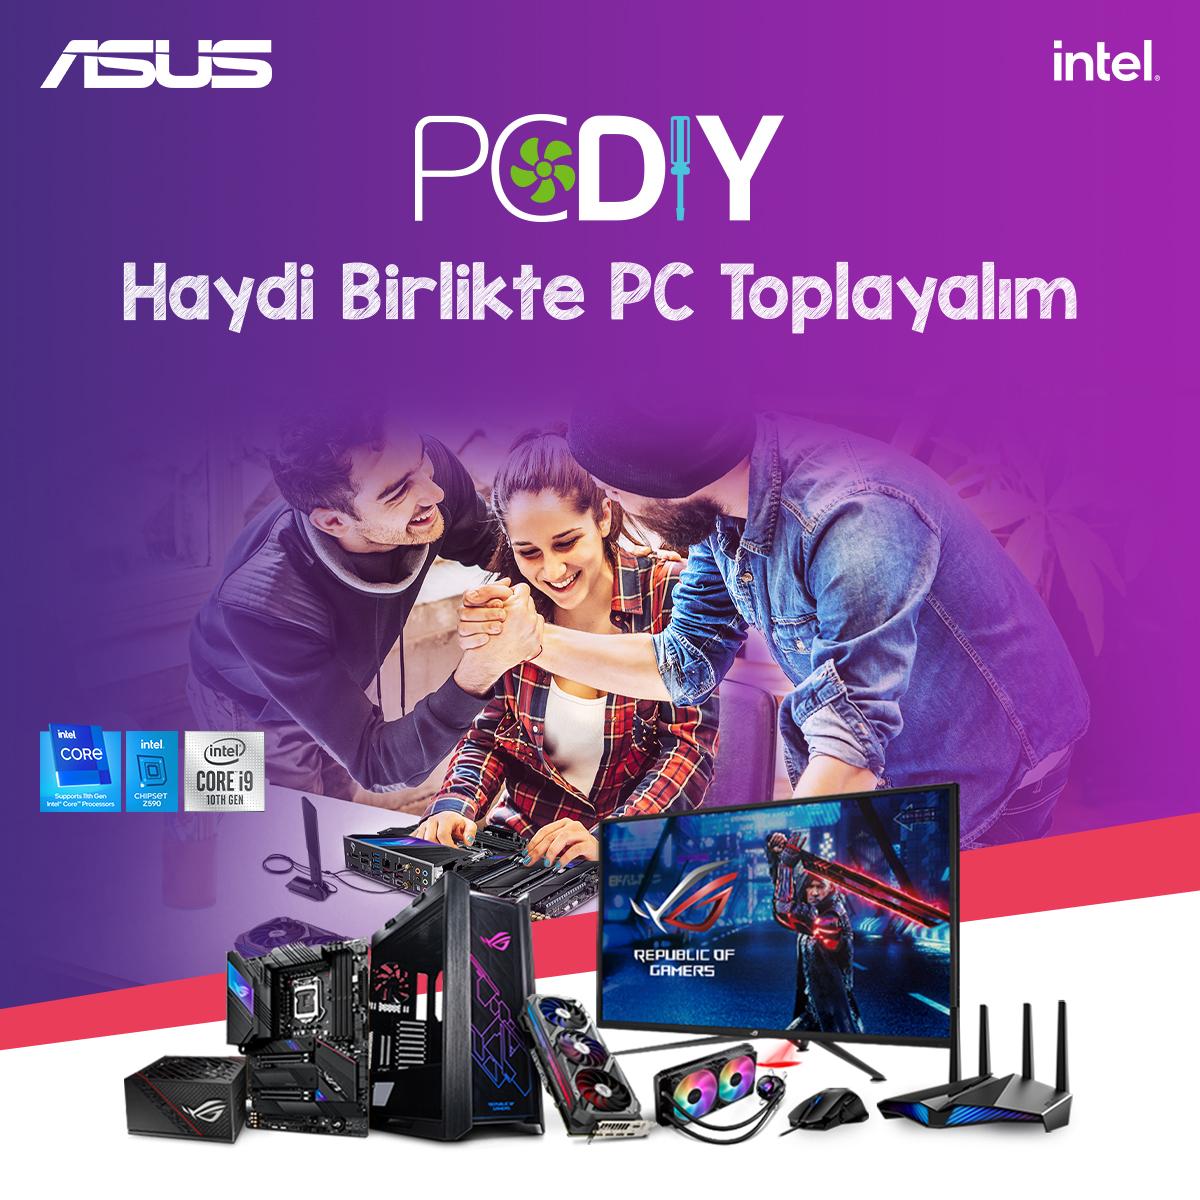 ASUS PC DIY PC toplama etkinliği